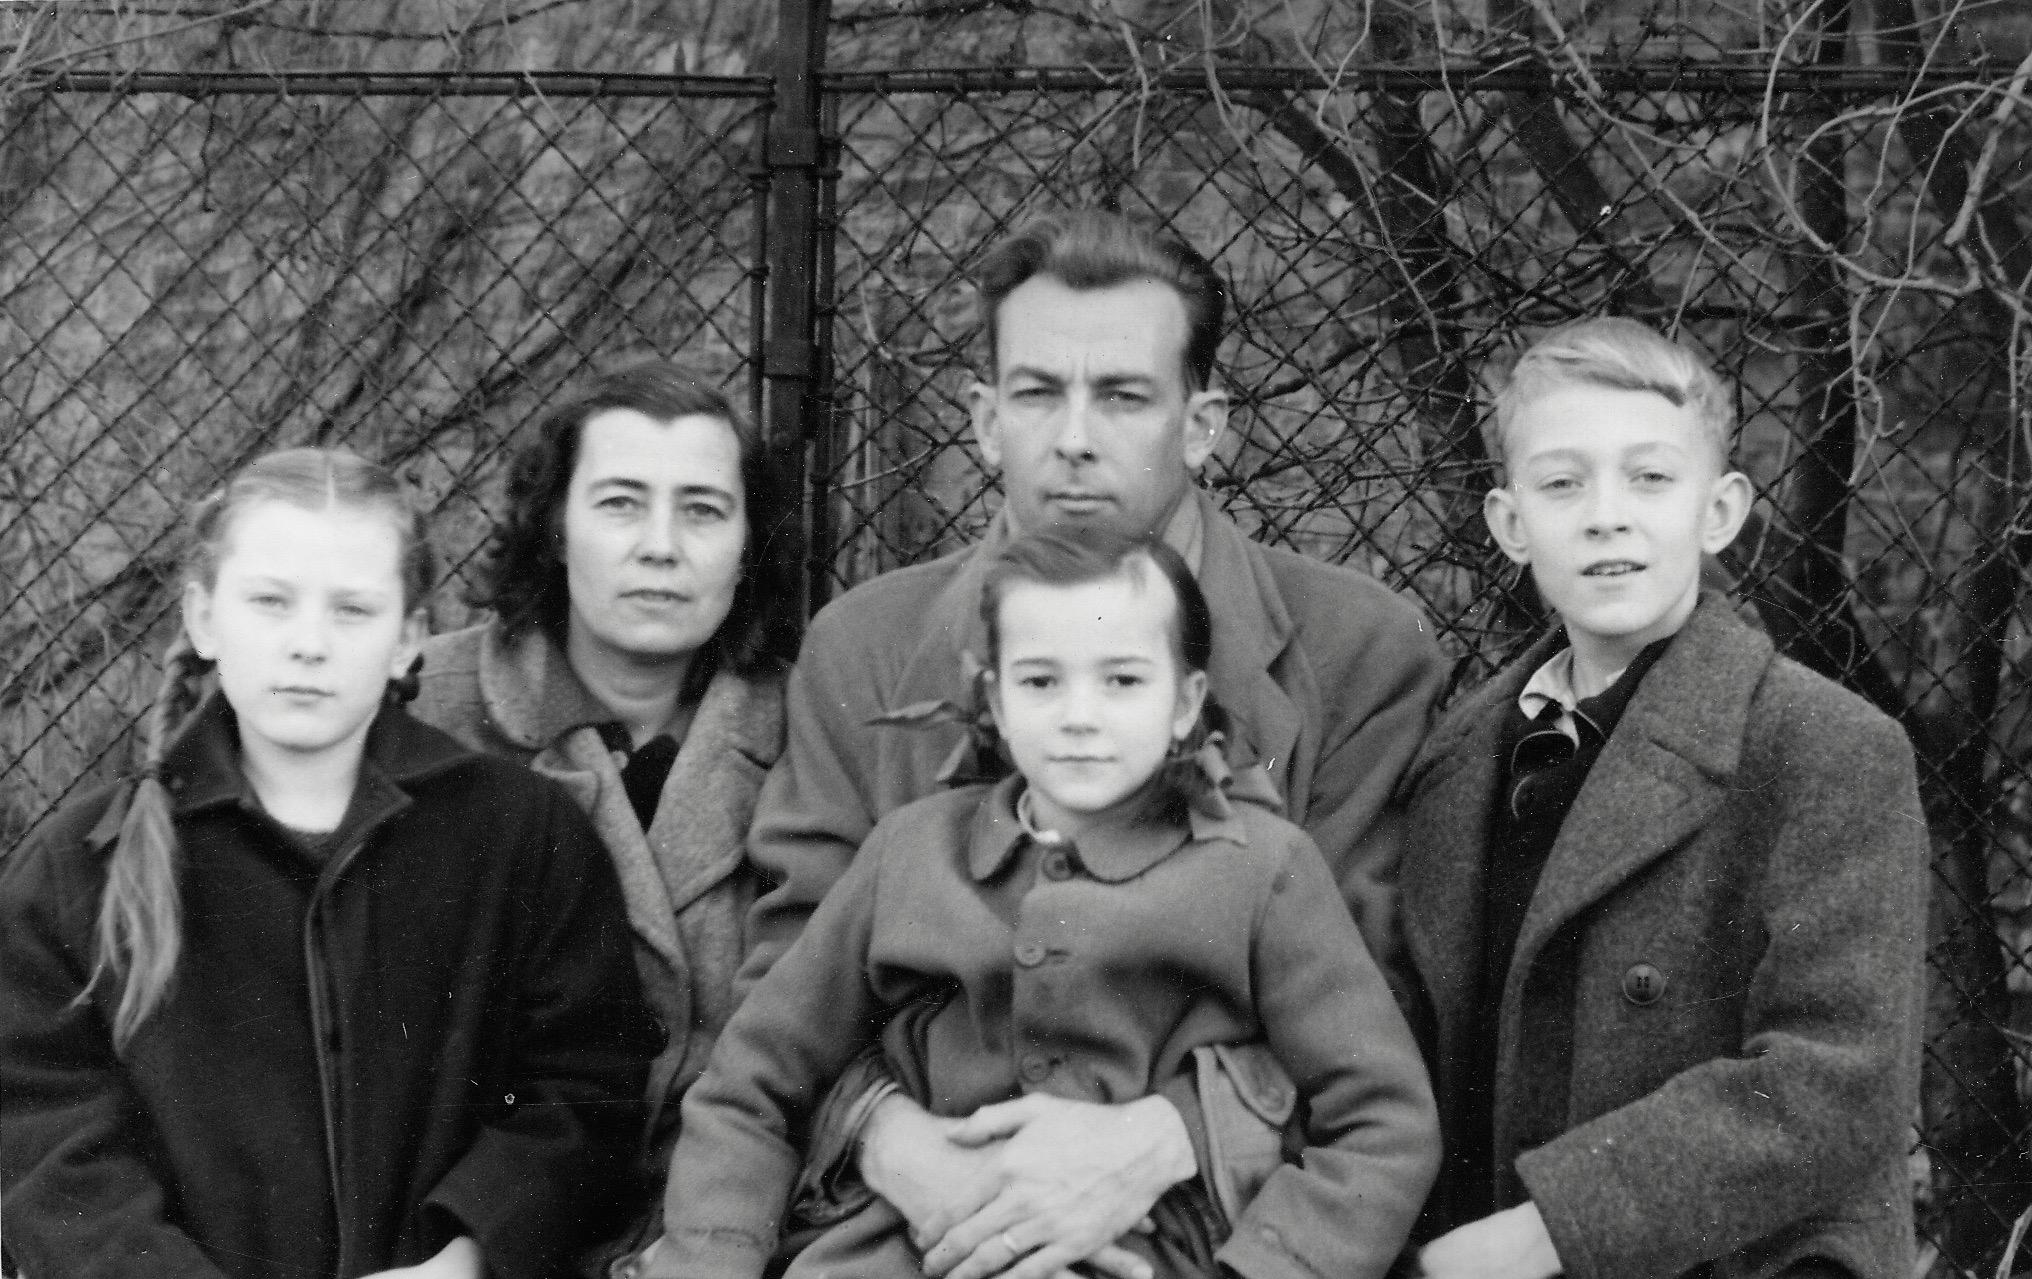 San Sabba, Peckovsky family 29 January 1952